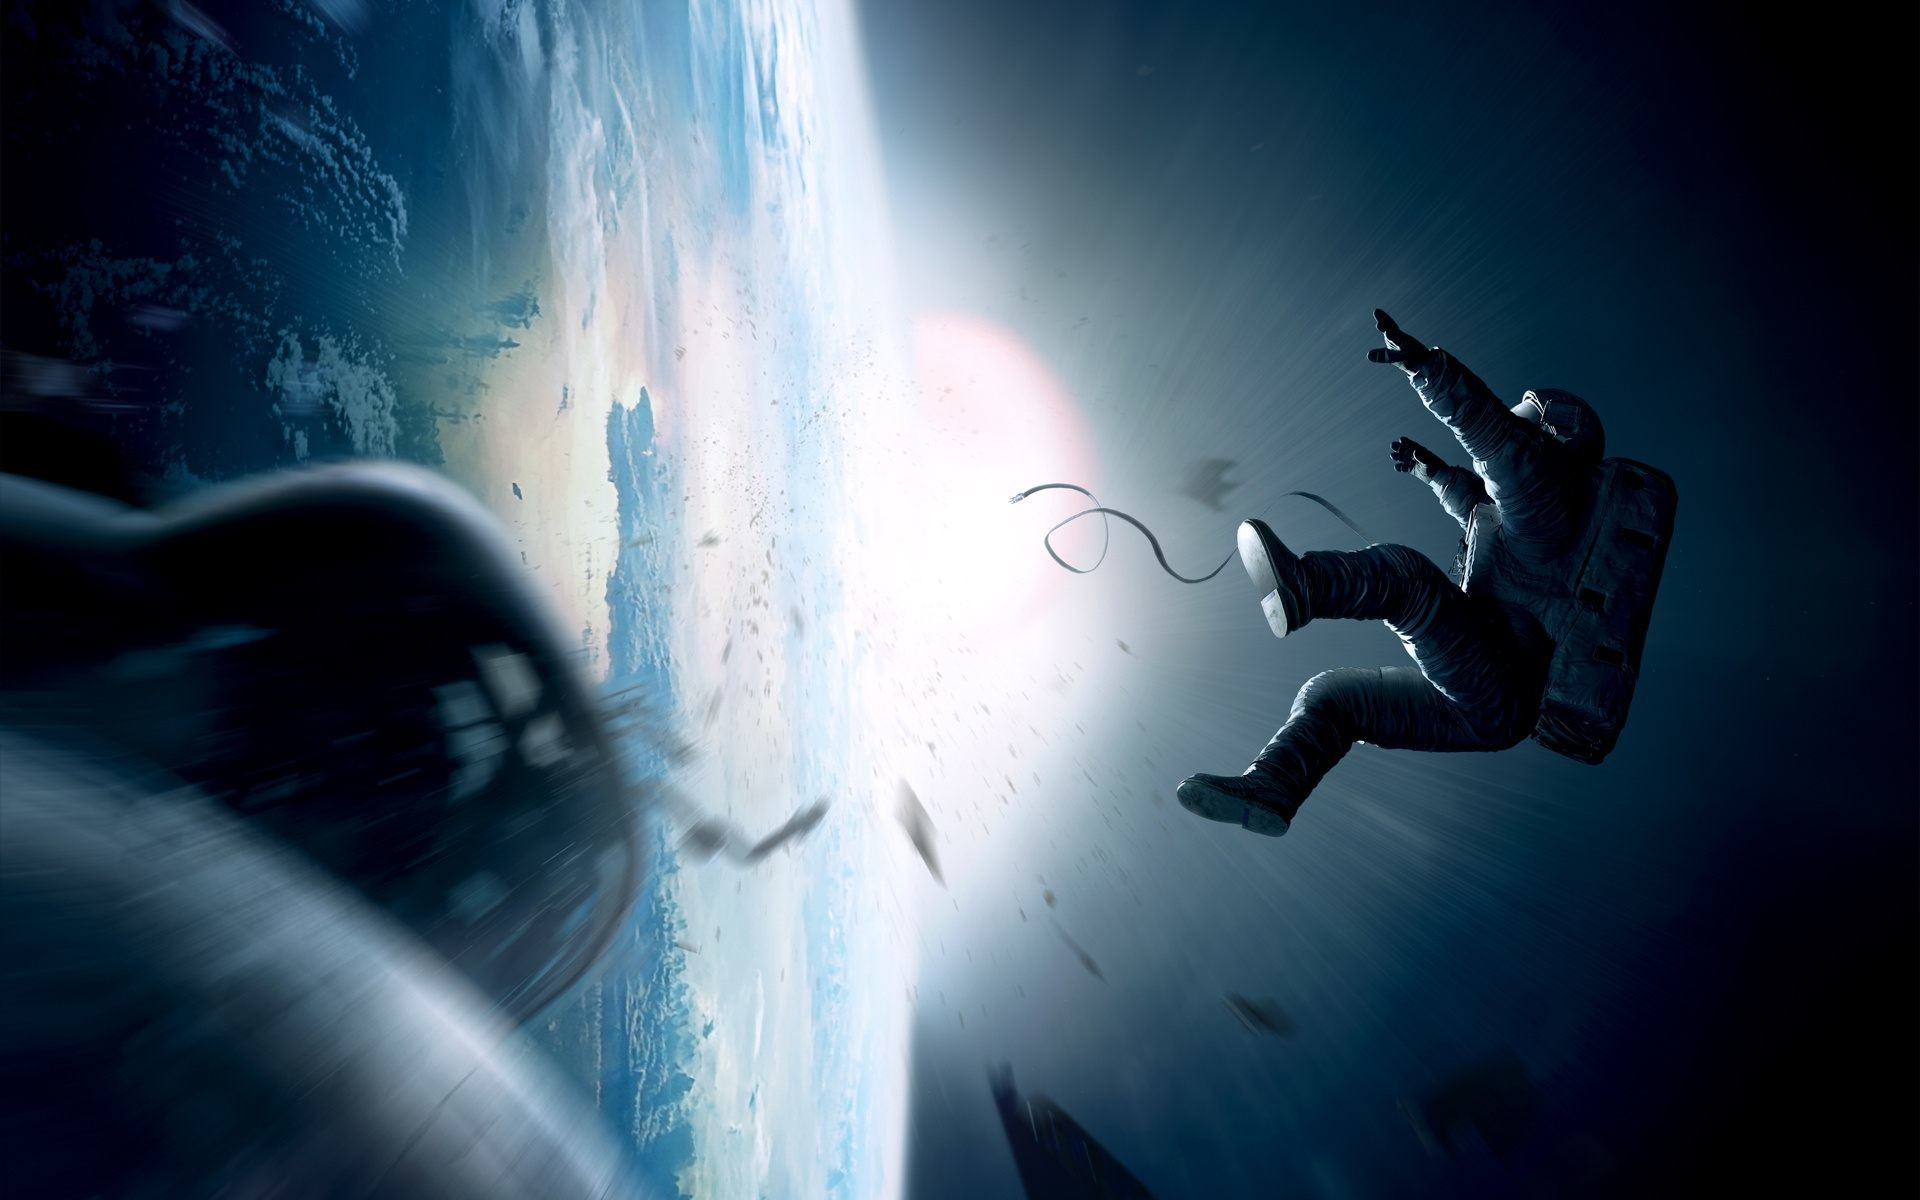 Surreal Astronaut Image …